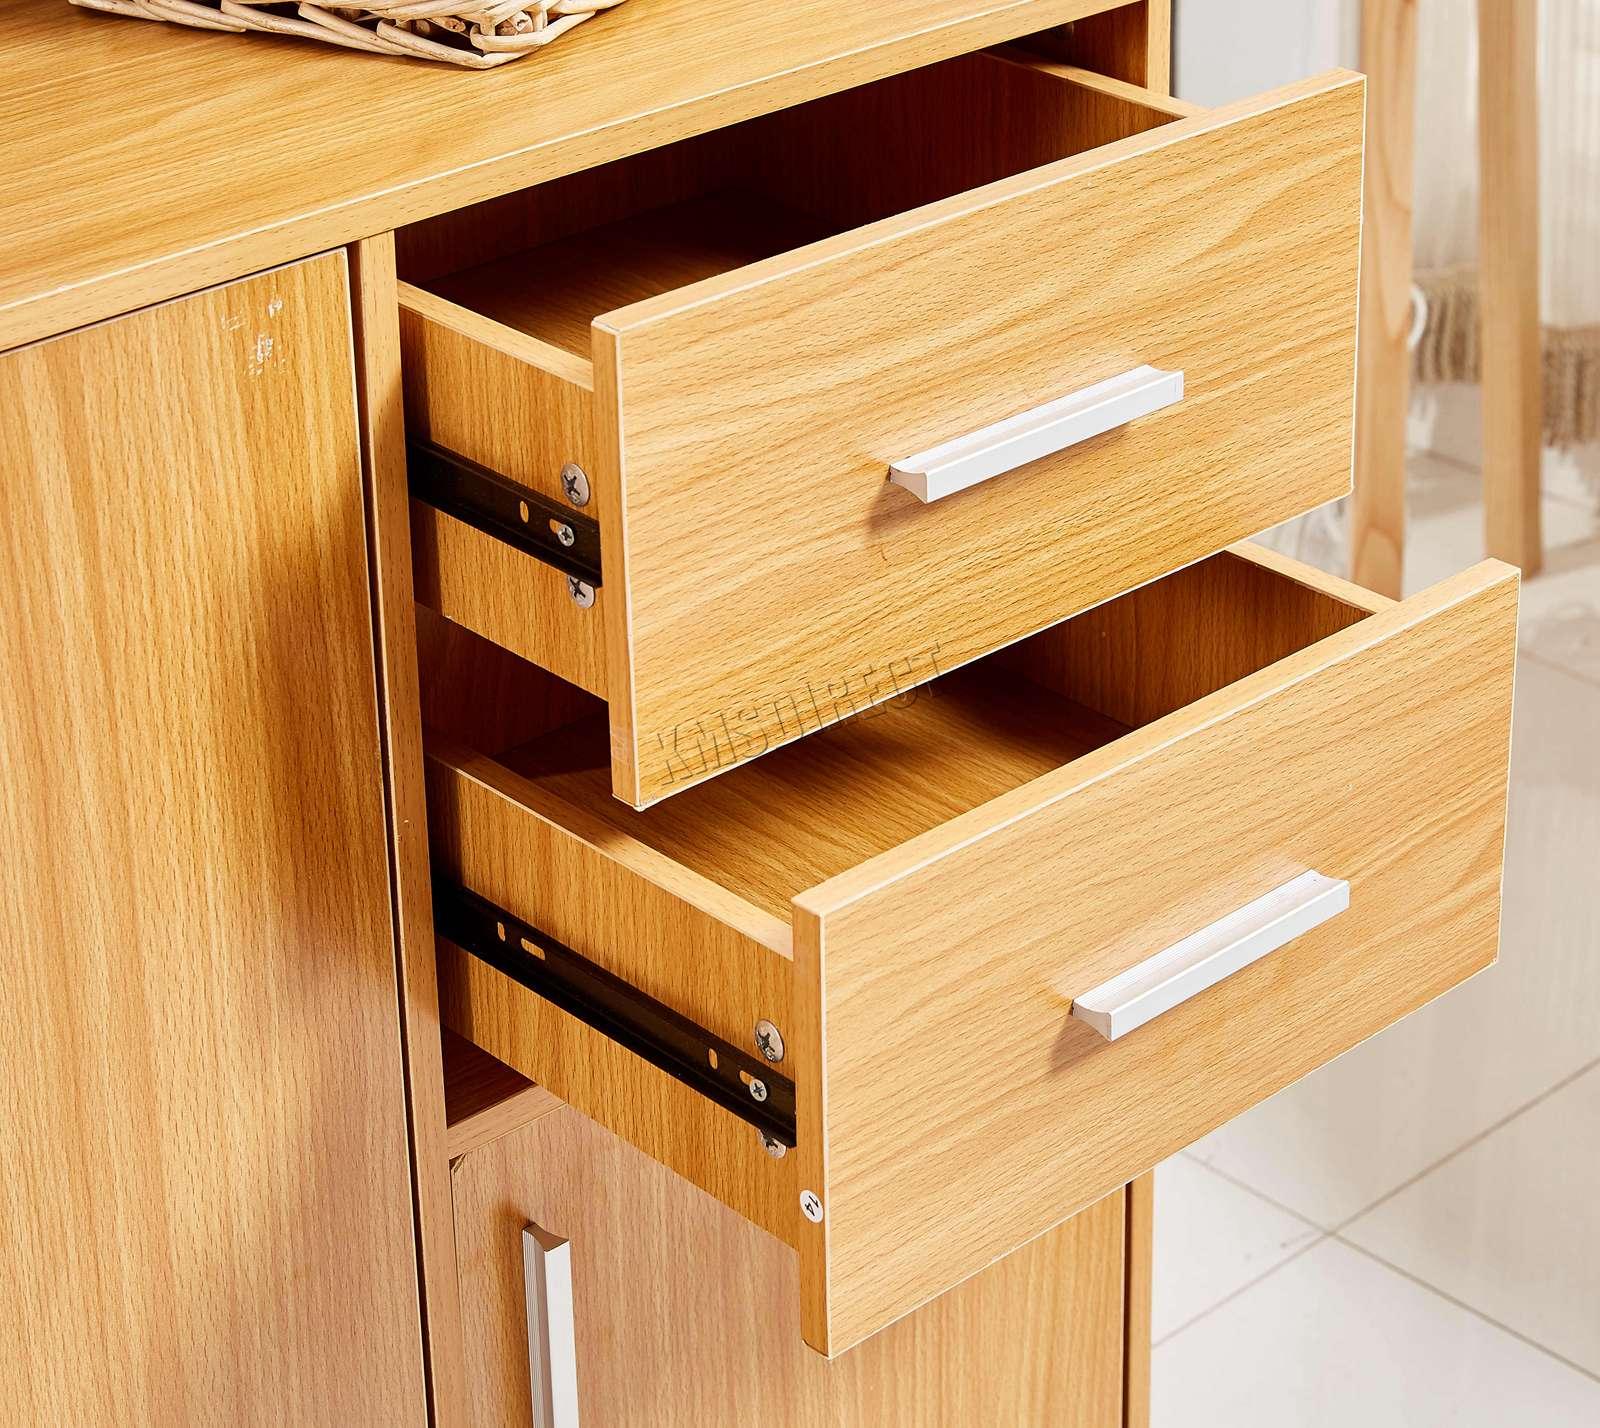 WestWood-Sideboard-Cabinet-Storage-tableware-Kitchen-Cupboard-Unit-PB-SSP01-NEW thumbnail 19